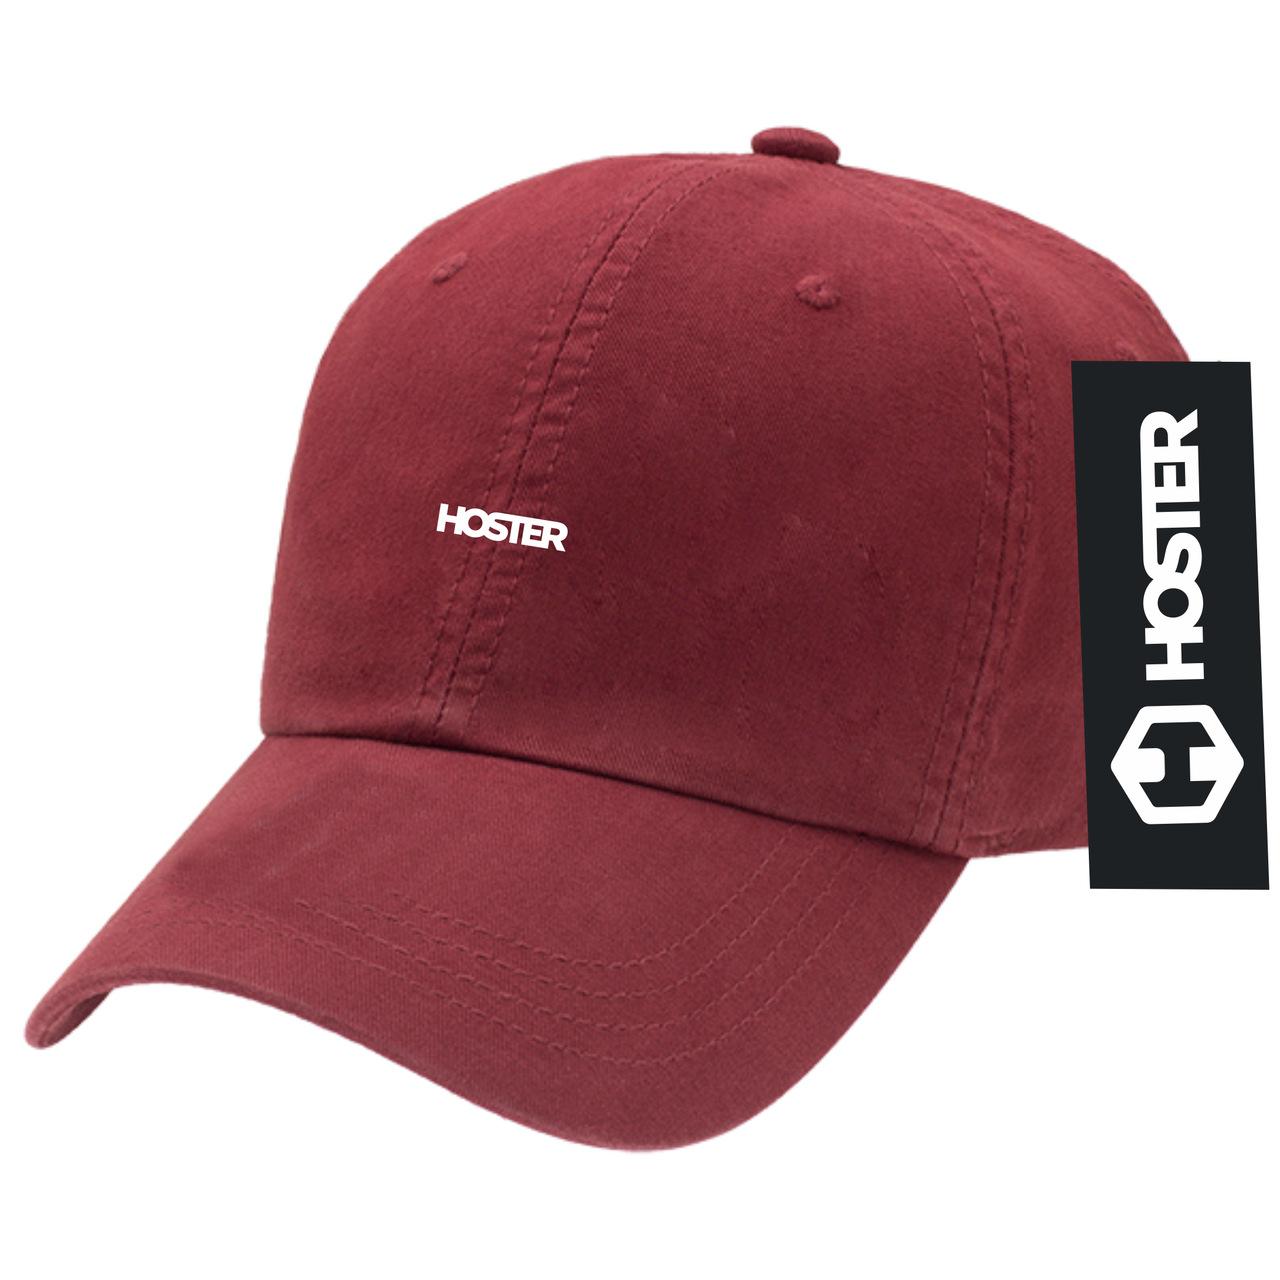 Boné Dad Hat Strapback Bordô Athleisure HOSTER